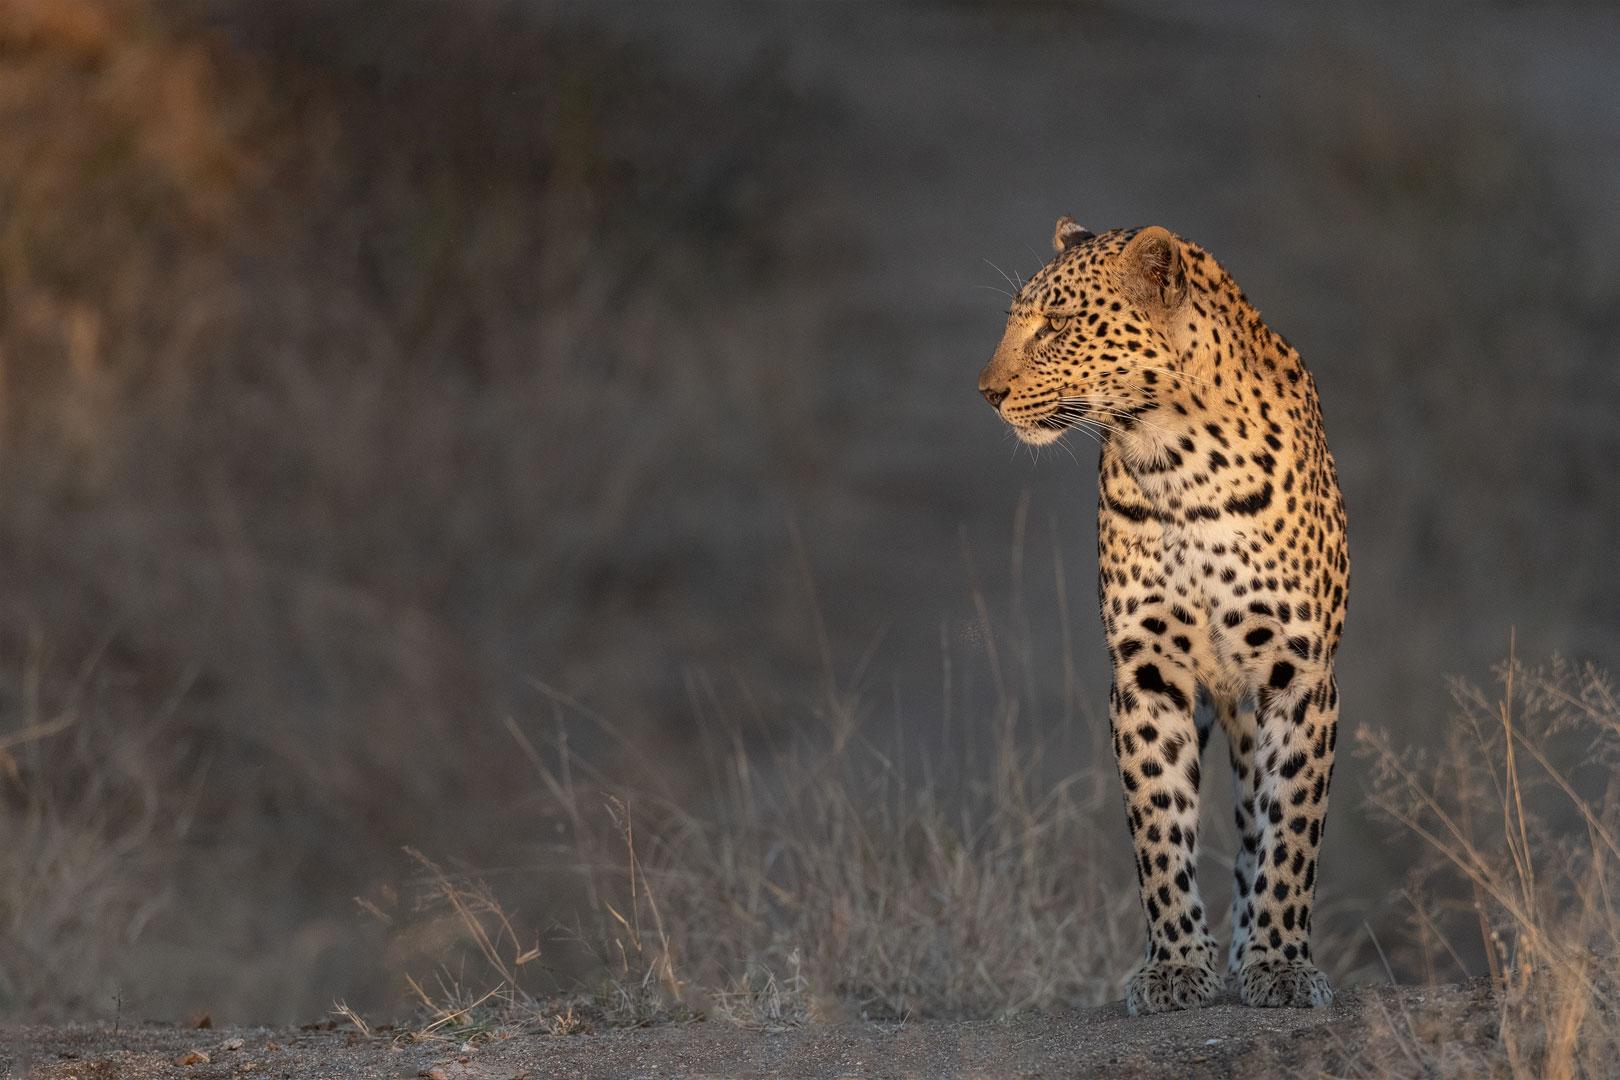 Leoparden in Südafrika (1)